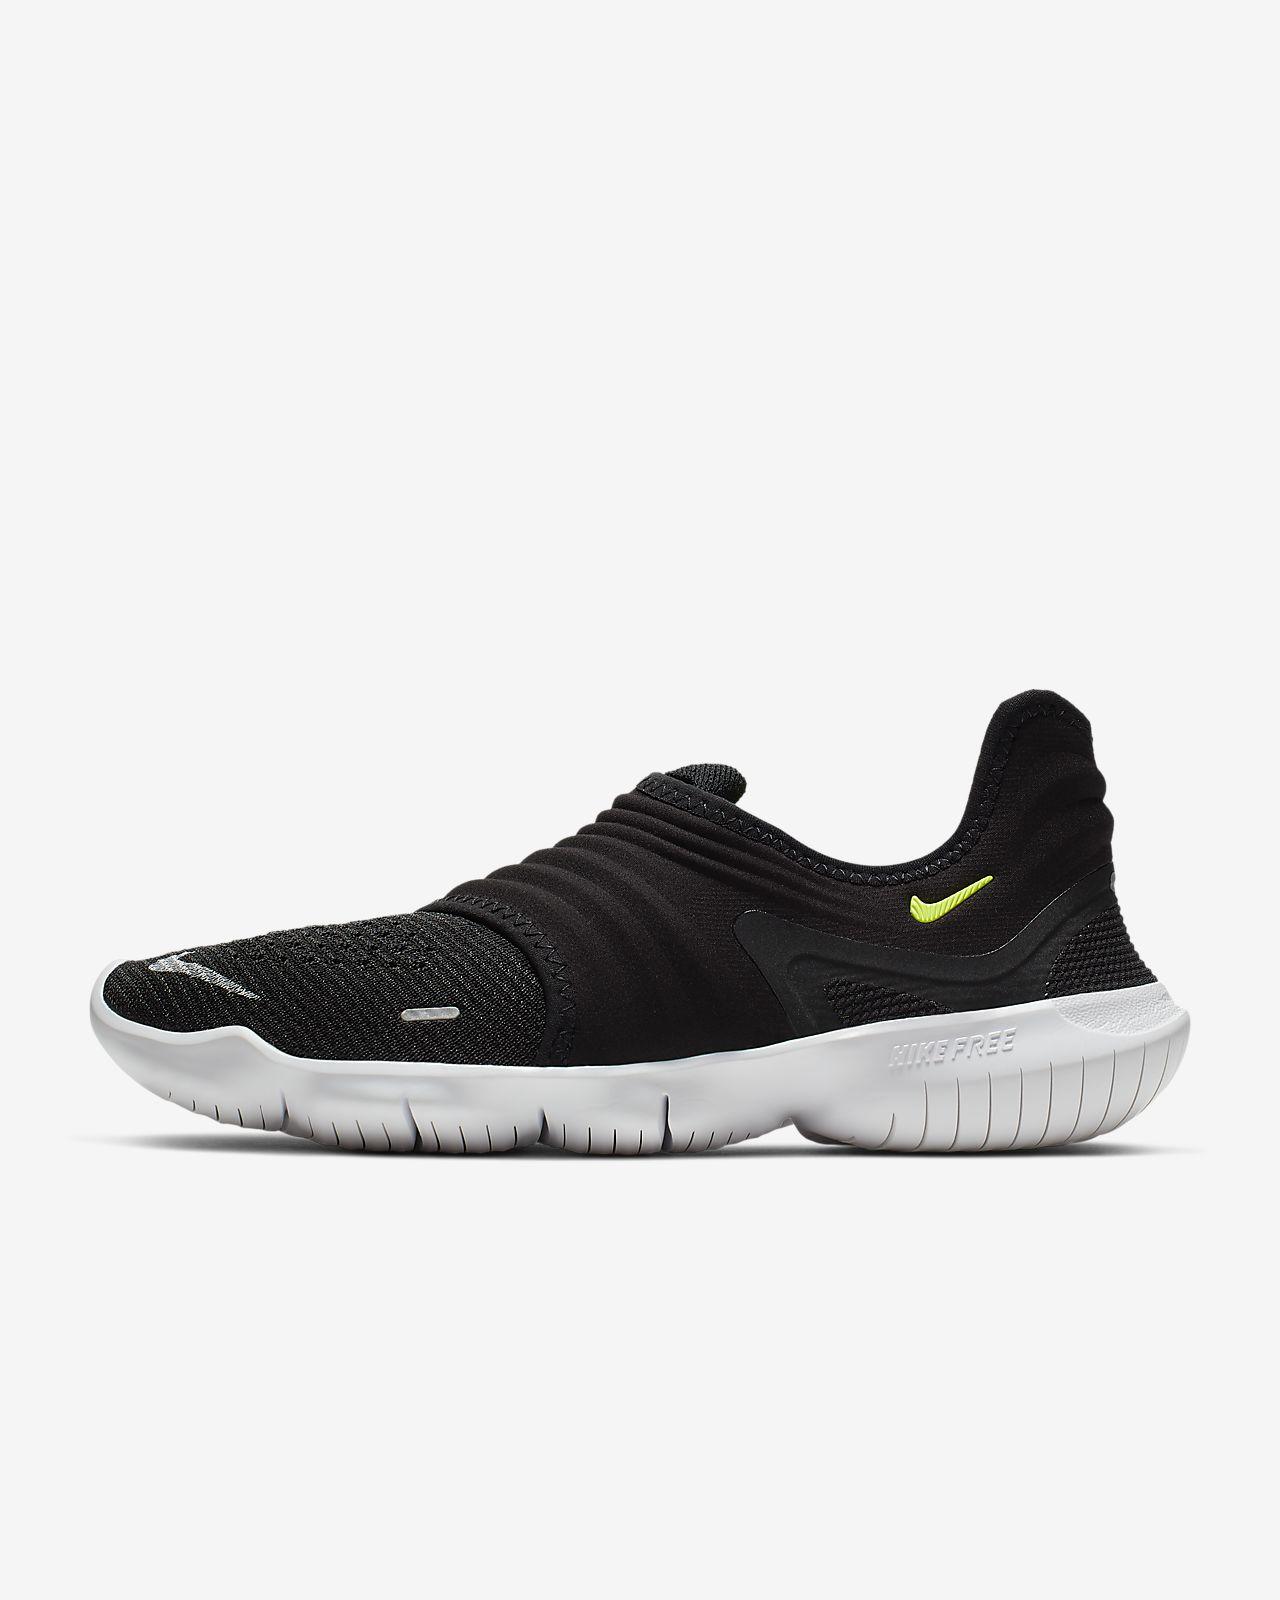 Nike Free RN Flyknit 3.0 løpesko til dame